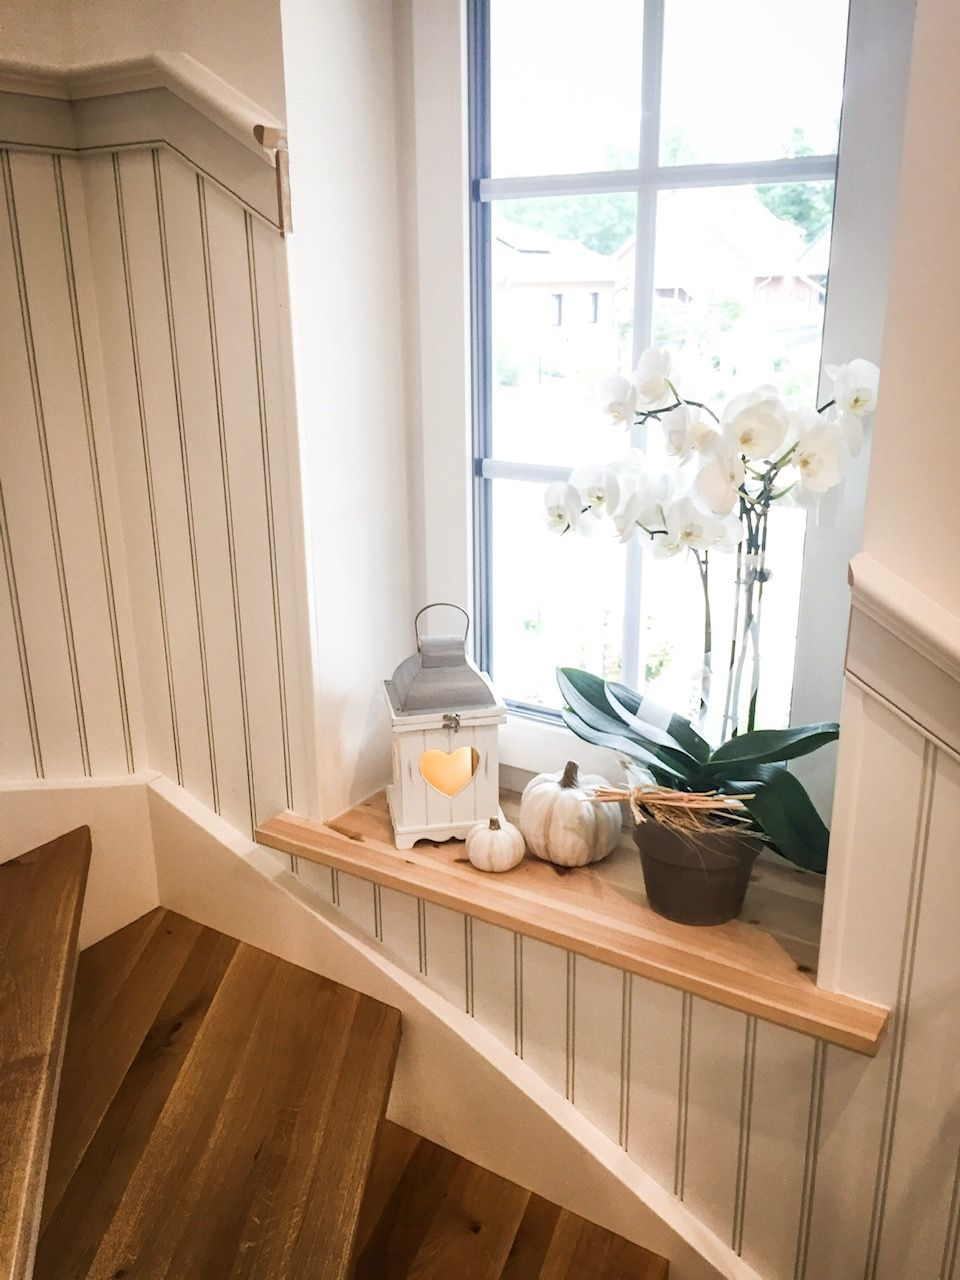 Wandpaneele Im Treppenhaus Beadboard De Das Original Aus Den Usa Treppe Haus Wandpaneele Treppenhaus